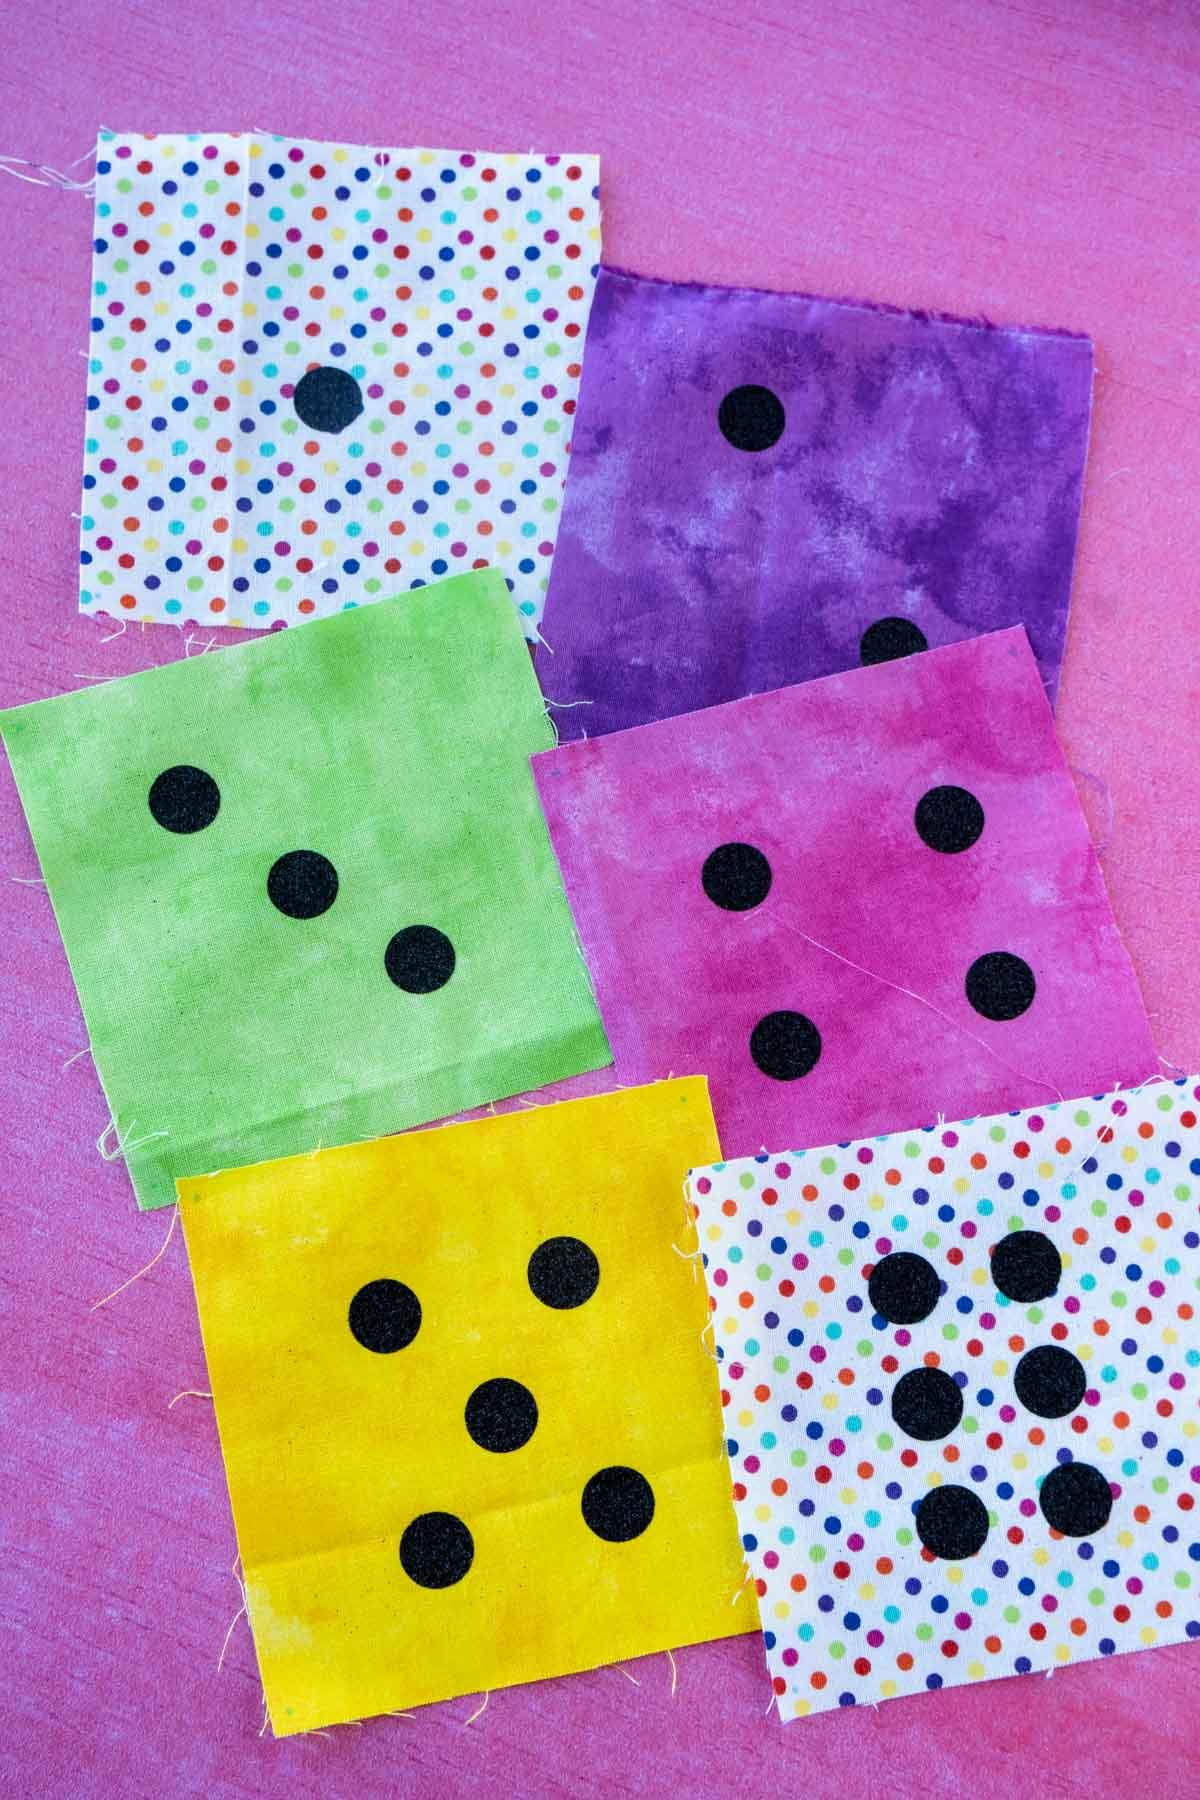 Fabric with DIY dice designs on them